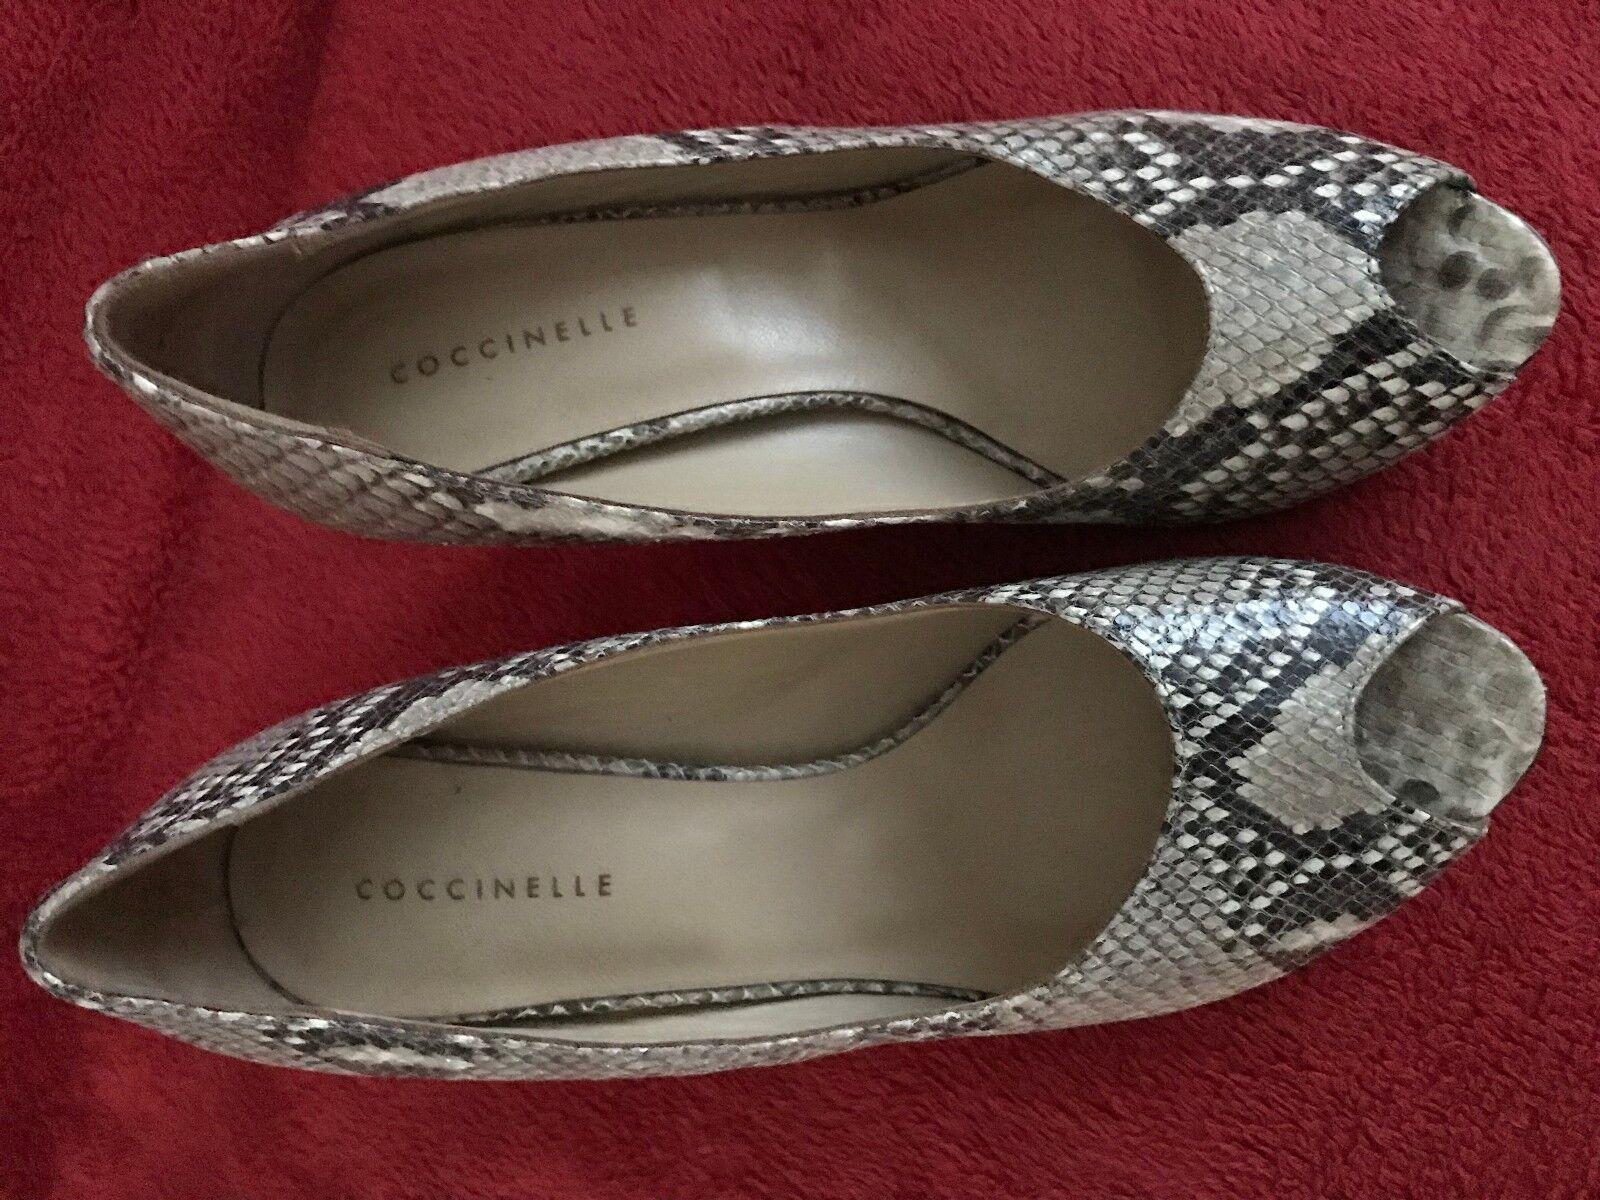 Coccinelle heels beige in size 8   41